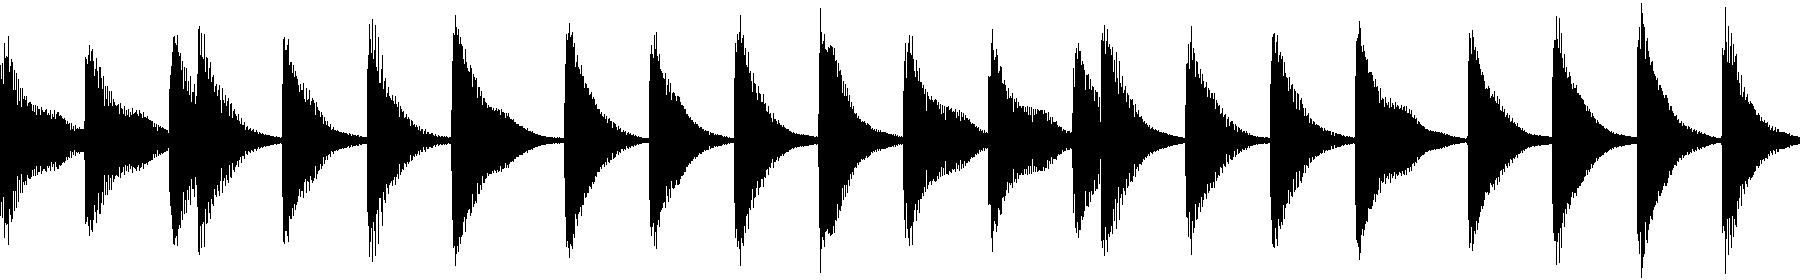 vedh melodyloop 089 bm 124bpm